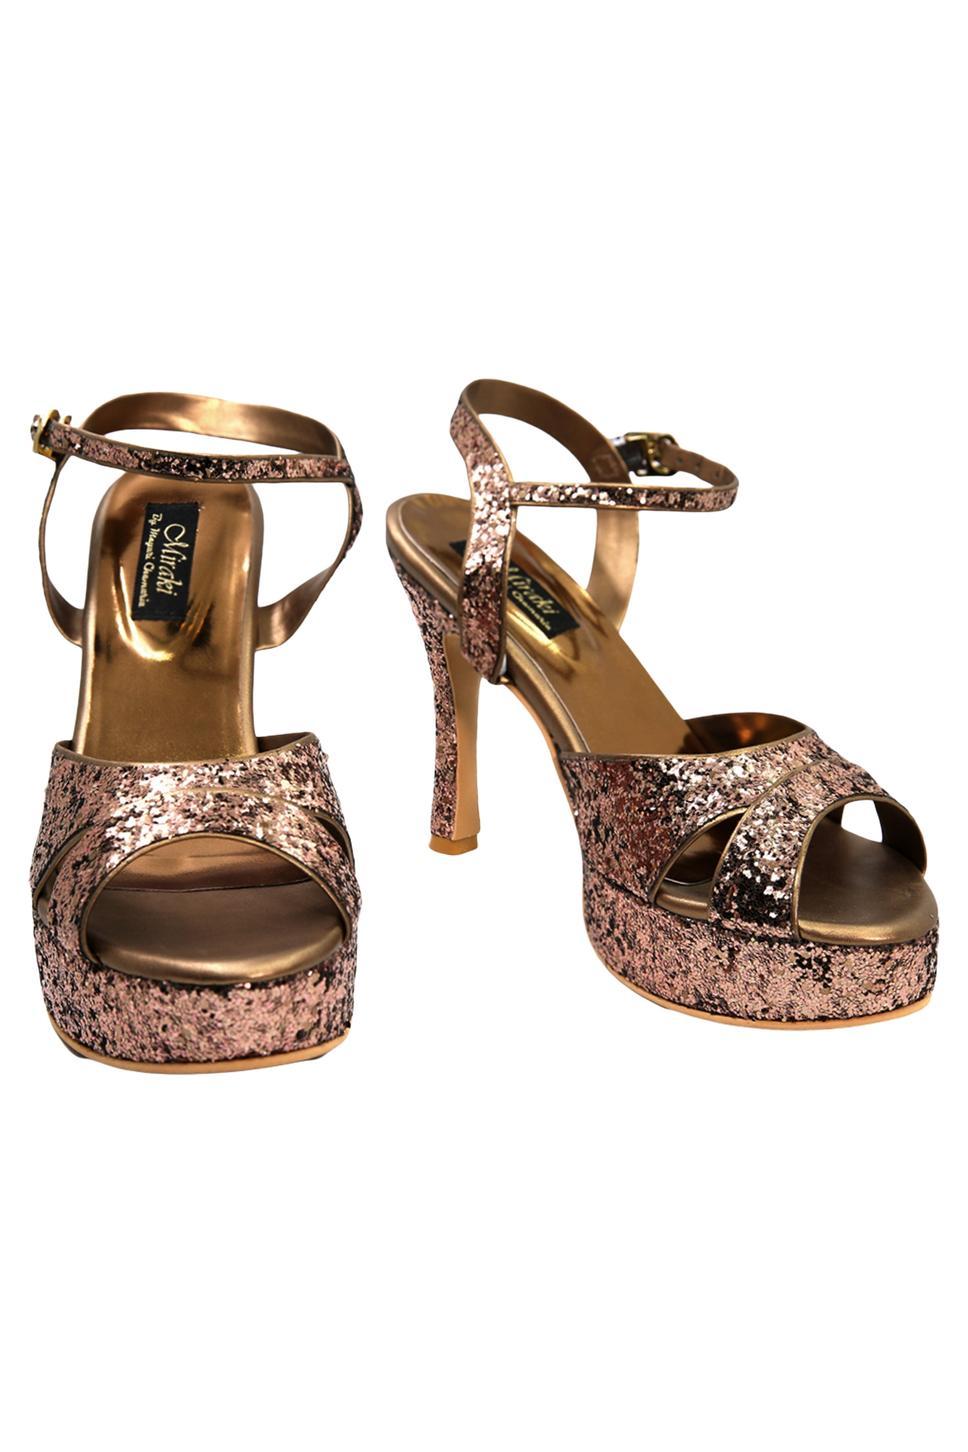 Ankle Strap Stilettos